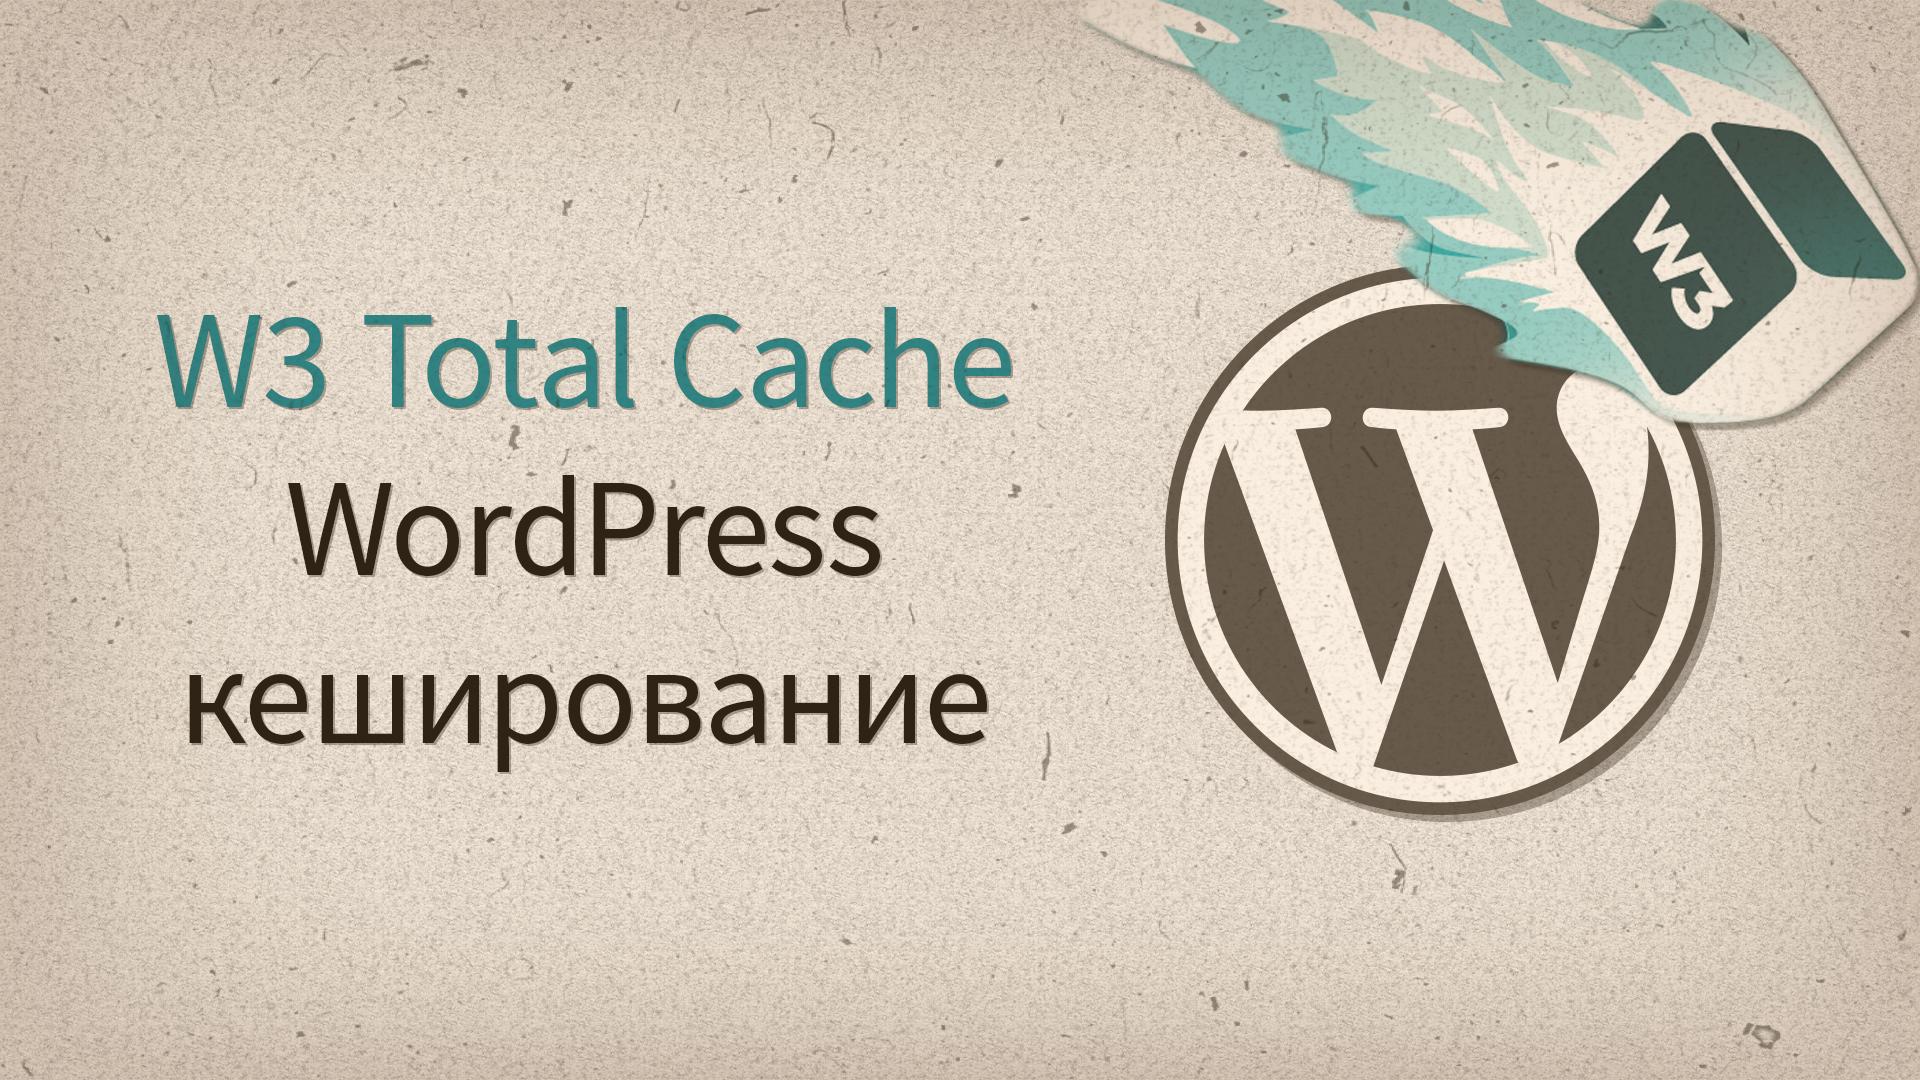 Кэширование в WordPress, теория и практика